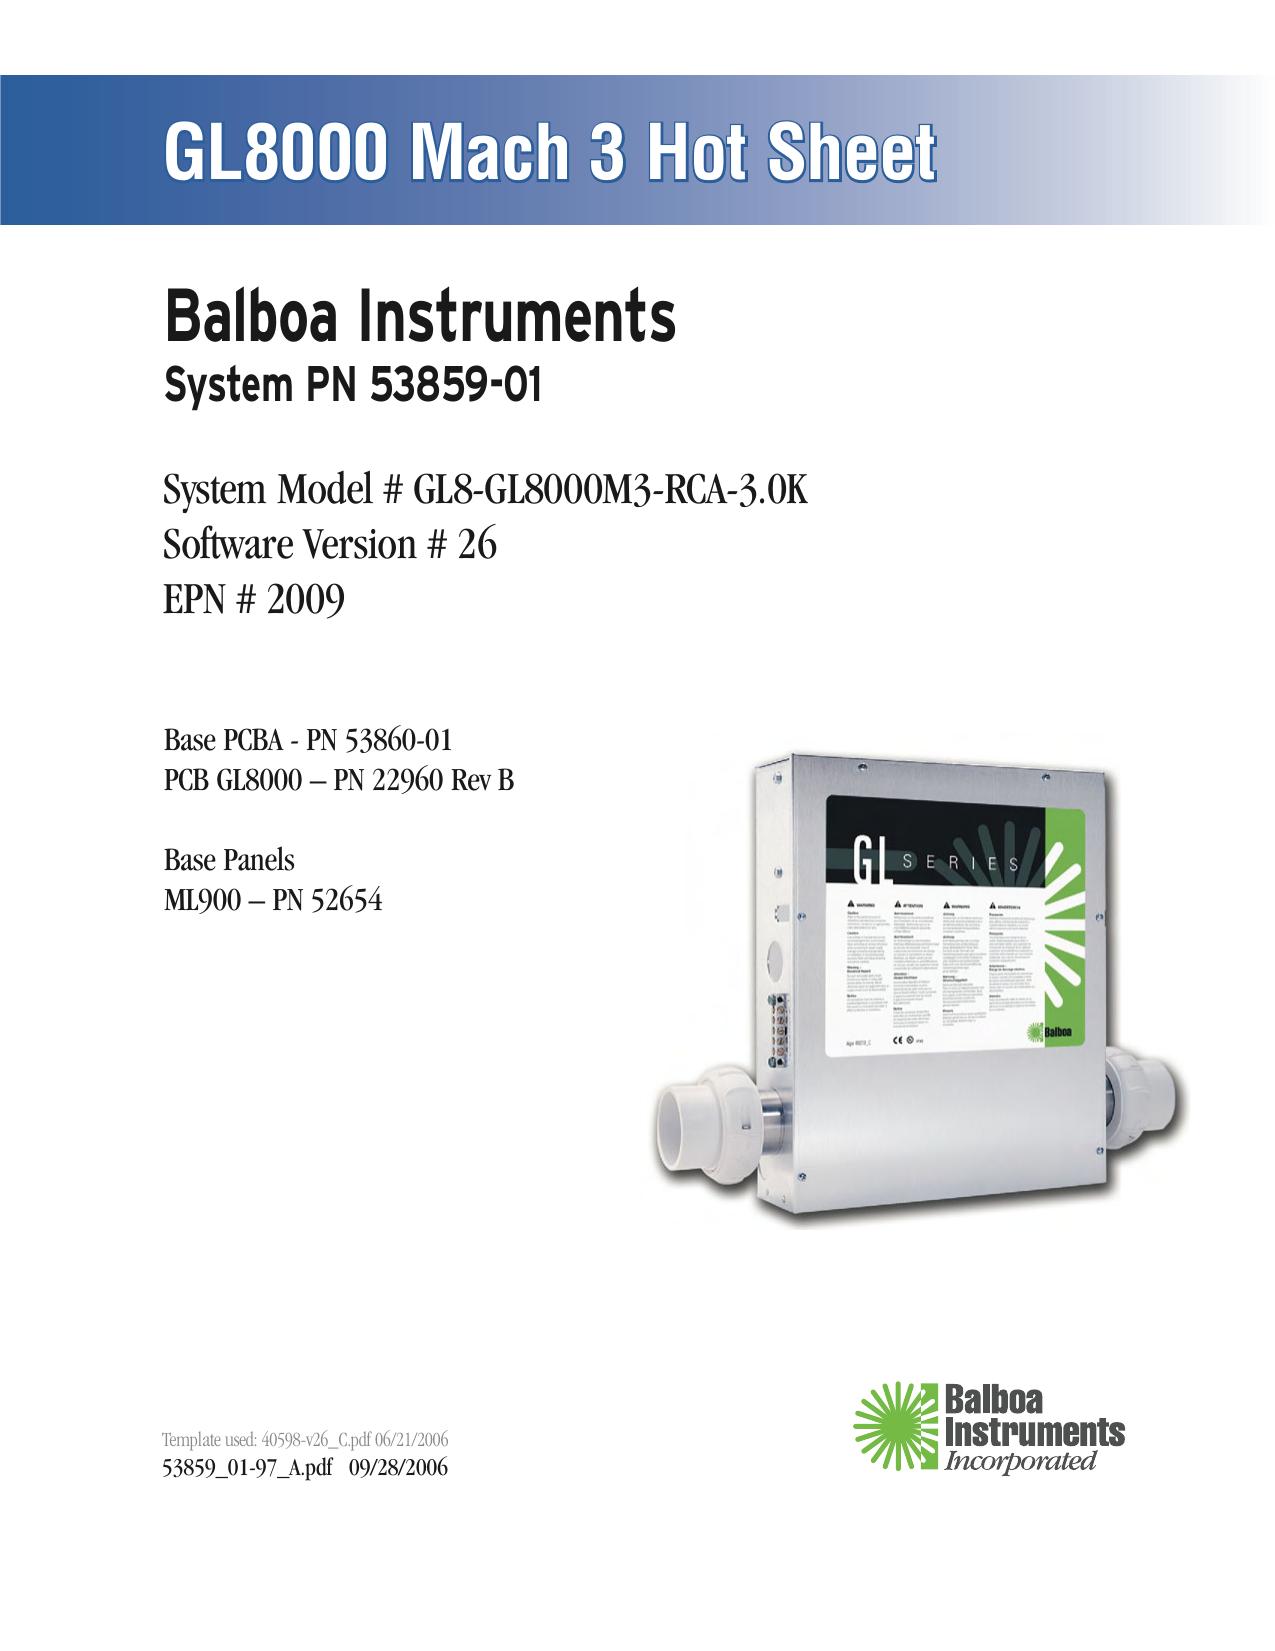 Balboa GL8000 Mach 3 v26 Hot Sheet   manualzz.com on